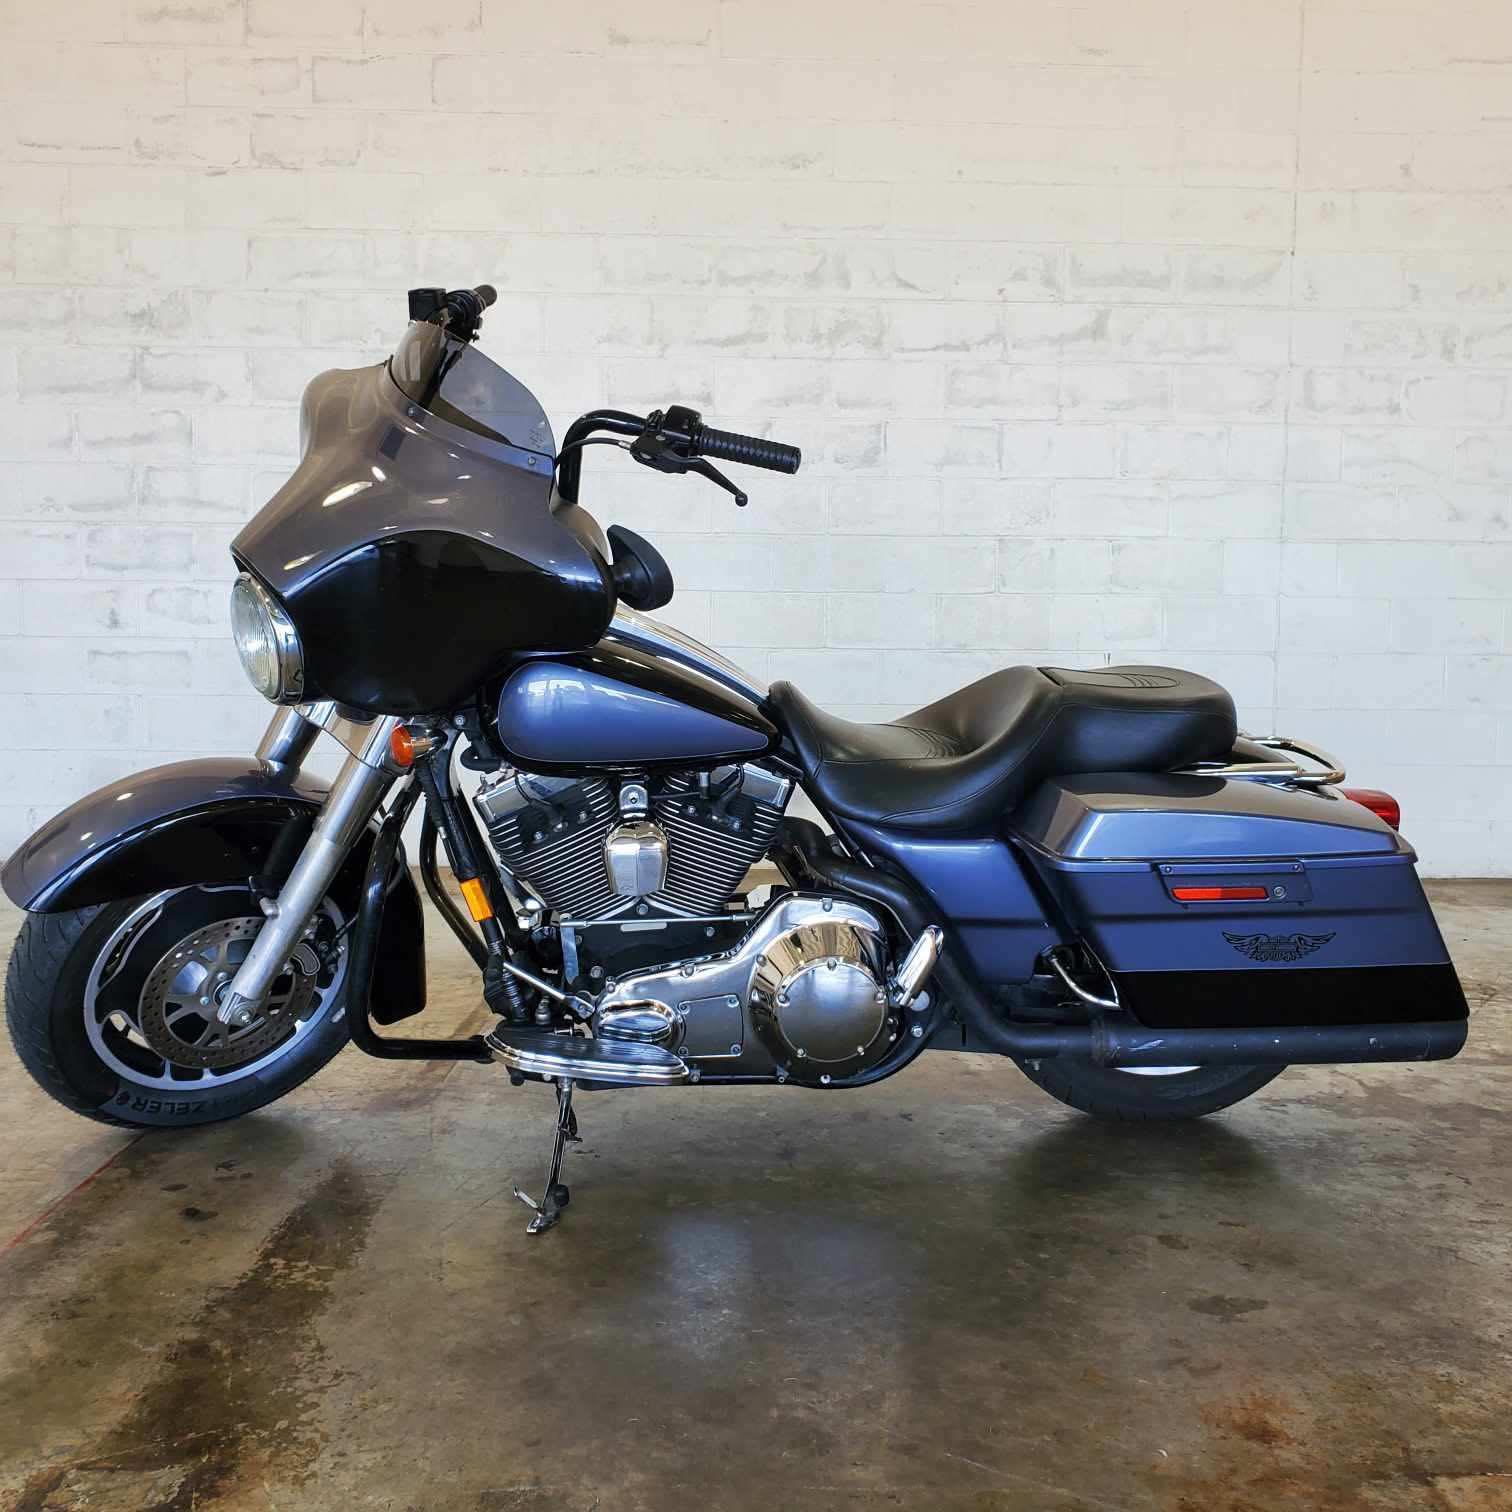 2006 Harley-Davidson Street Glide Base at Twisted Cycles